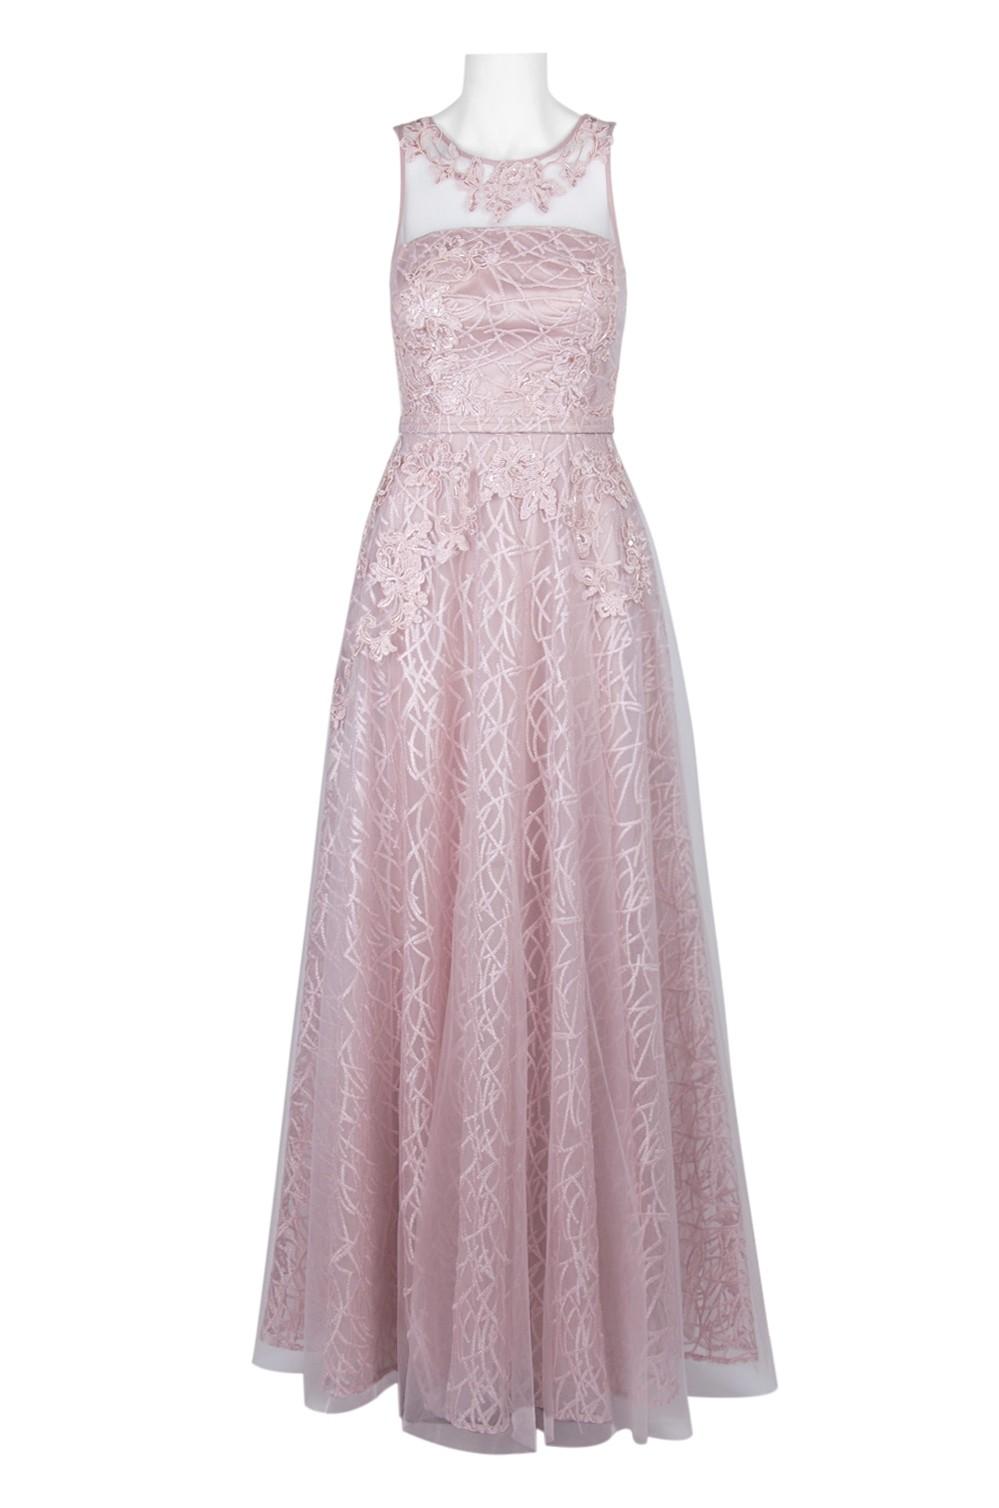 3781f70f9c Decode Scoop Neck Sleeveless Illusion V-Back Embroidered Mesh Dress ...